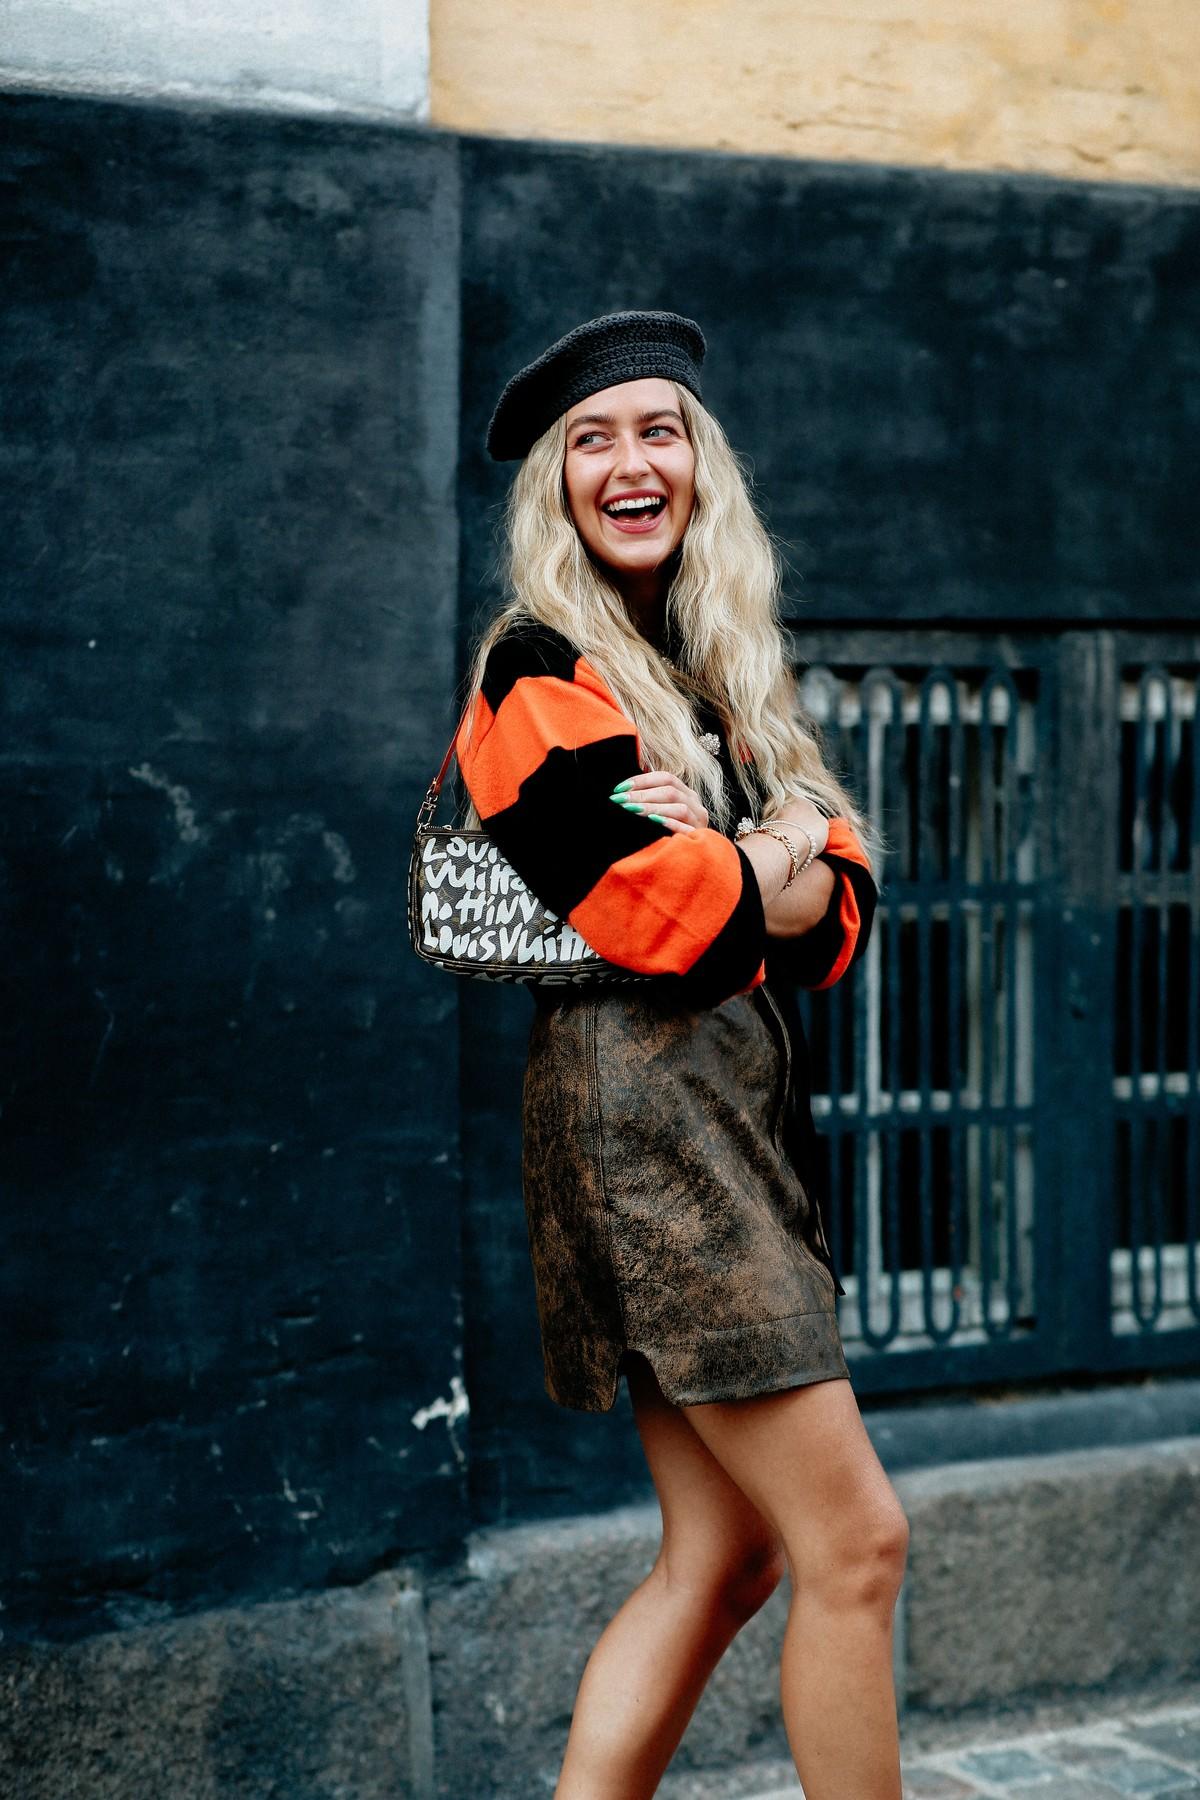 Street style, Emili Sindlev arriving at Ganni Spring Summer 2021 show, held at Badsmandsstraede, Copenhagen, Denmark, on August 10th, 2020.,Image: 551765319, License: Rights-managed, Restrictions: , Model Release: no, Credit line: Bertrand-Hillion Marie-Paola/ABACA / Abaca Press / Profimedia